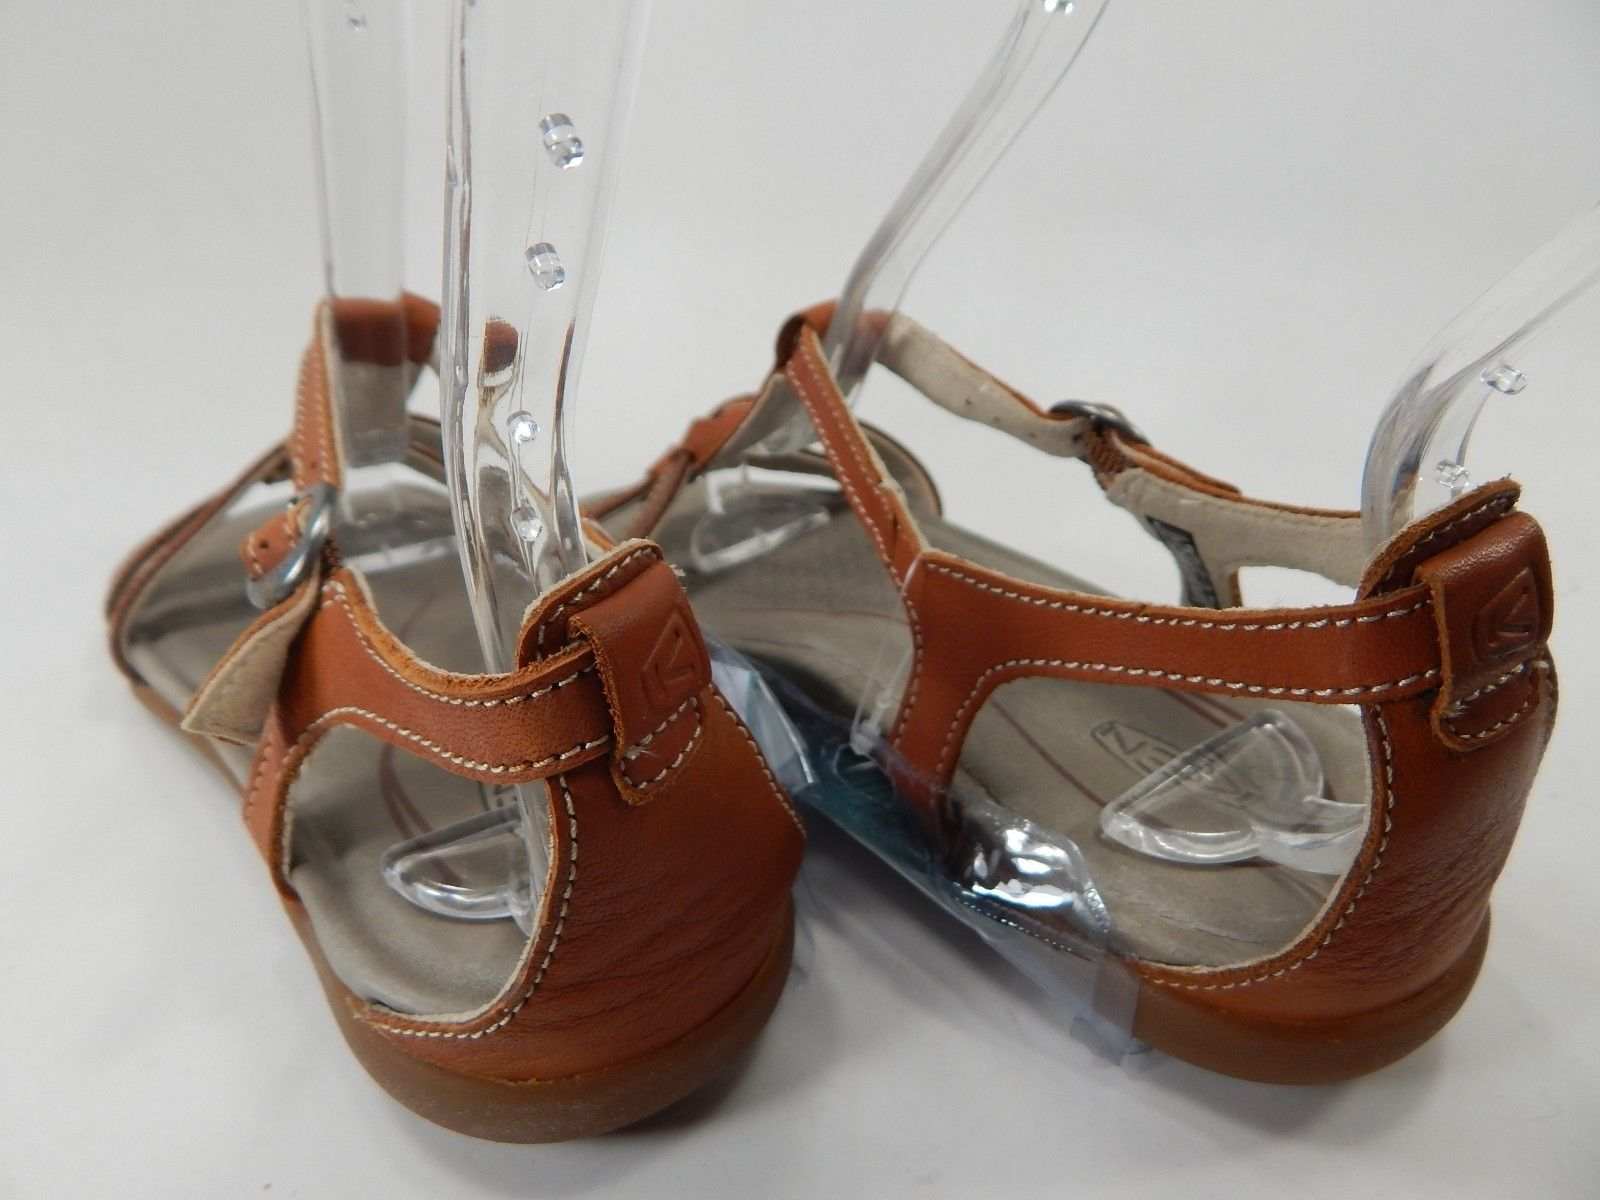 Keen Rose City T Strap Women's Sport Sandals Size 7 M EU 37.5 Jetty